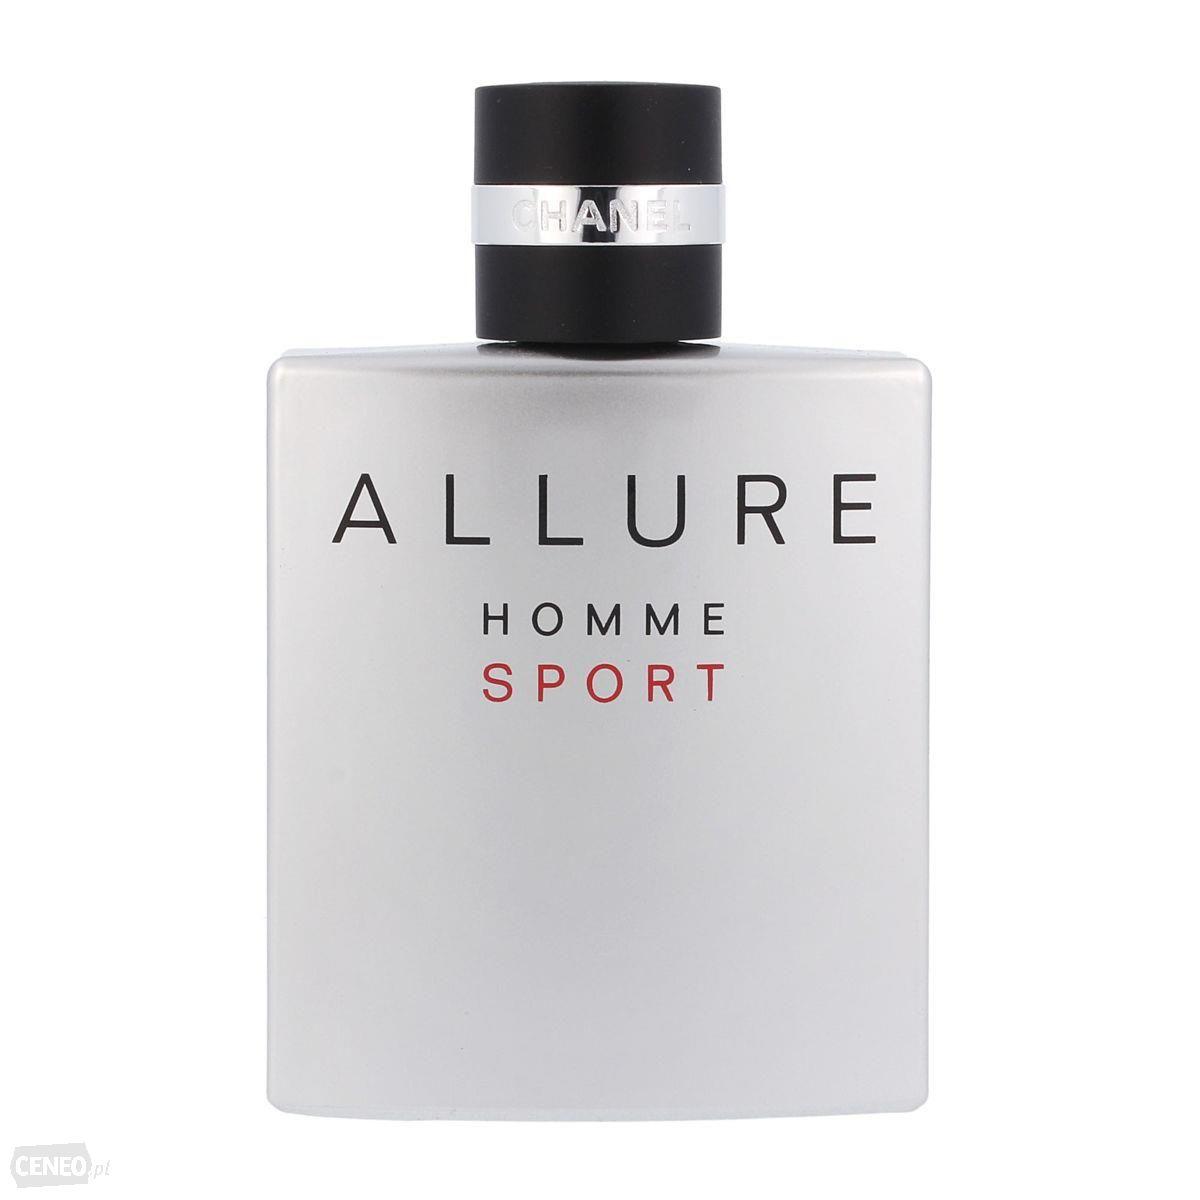 4551948a013c35 Chanel Allure homme SPORT 100ml EDT TESTER jakość - 7066247629 ...